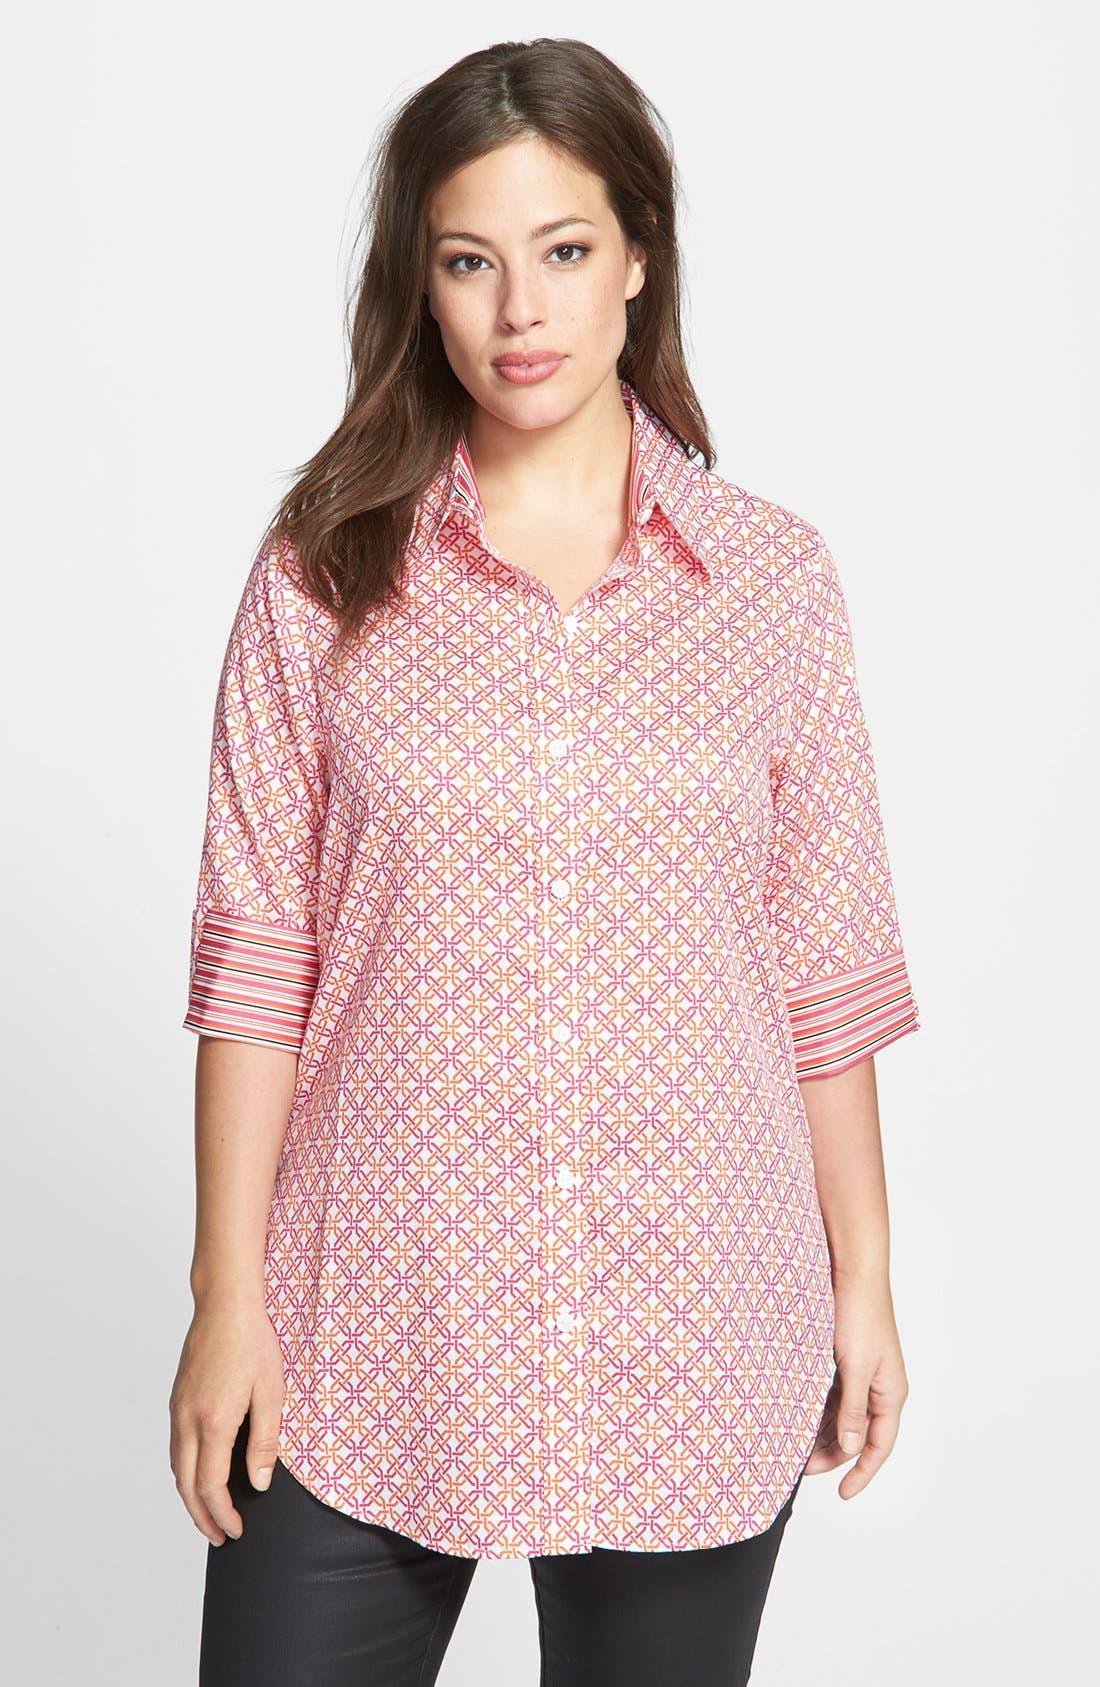 Alternate Image 1 Selected - Foxcroft Lattice Print Shirt (Plus Size)